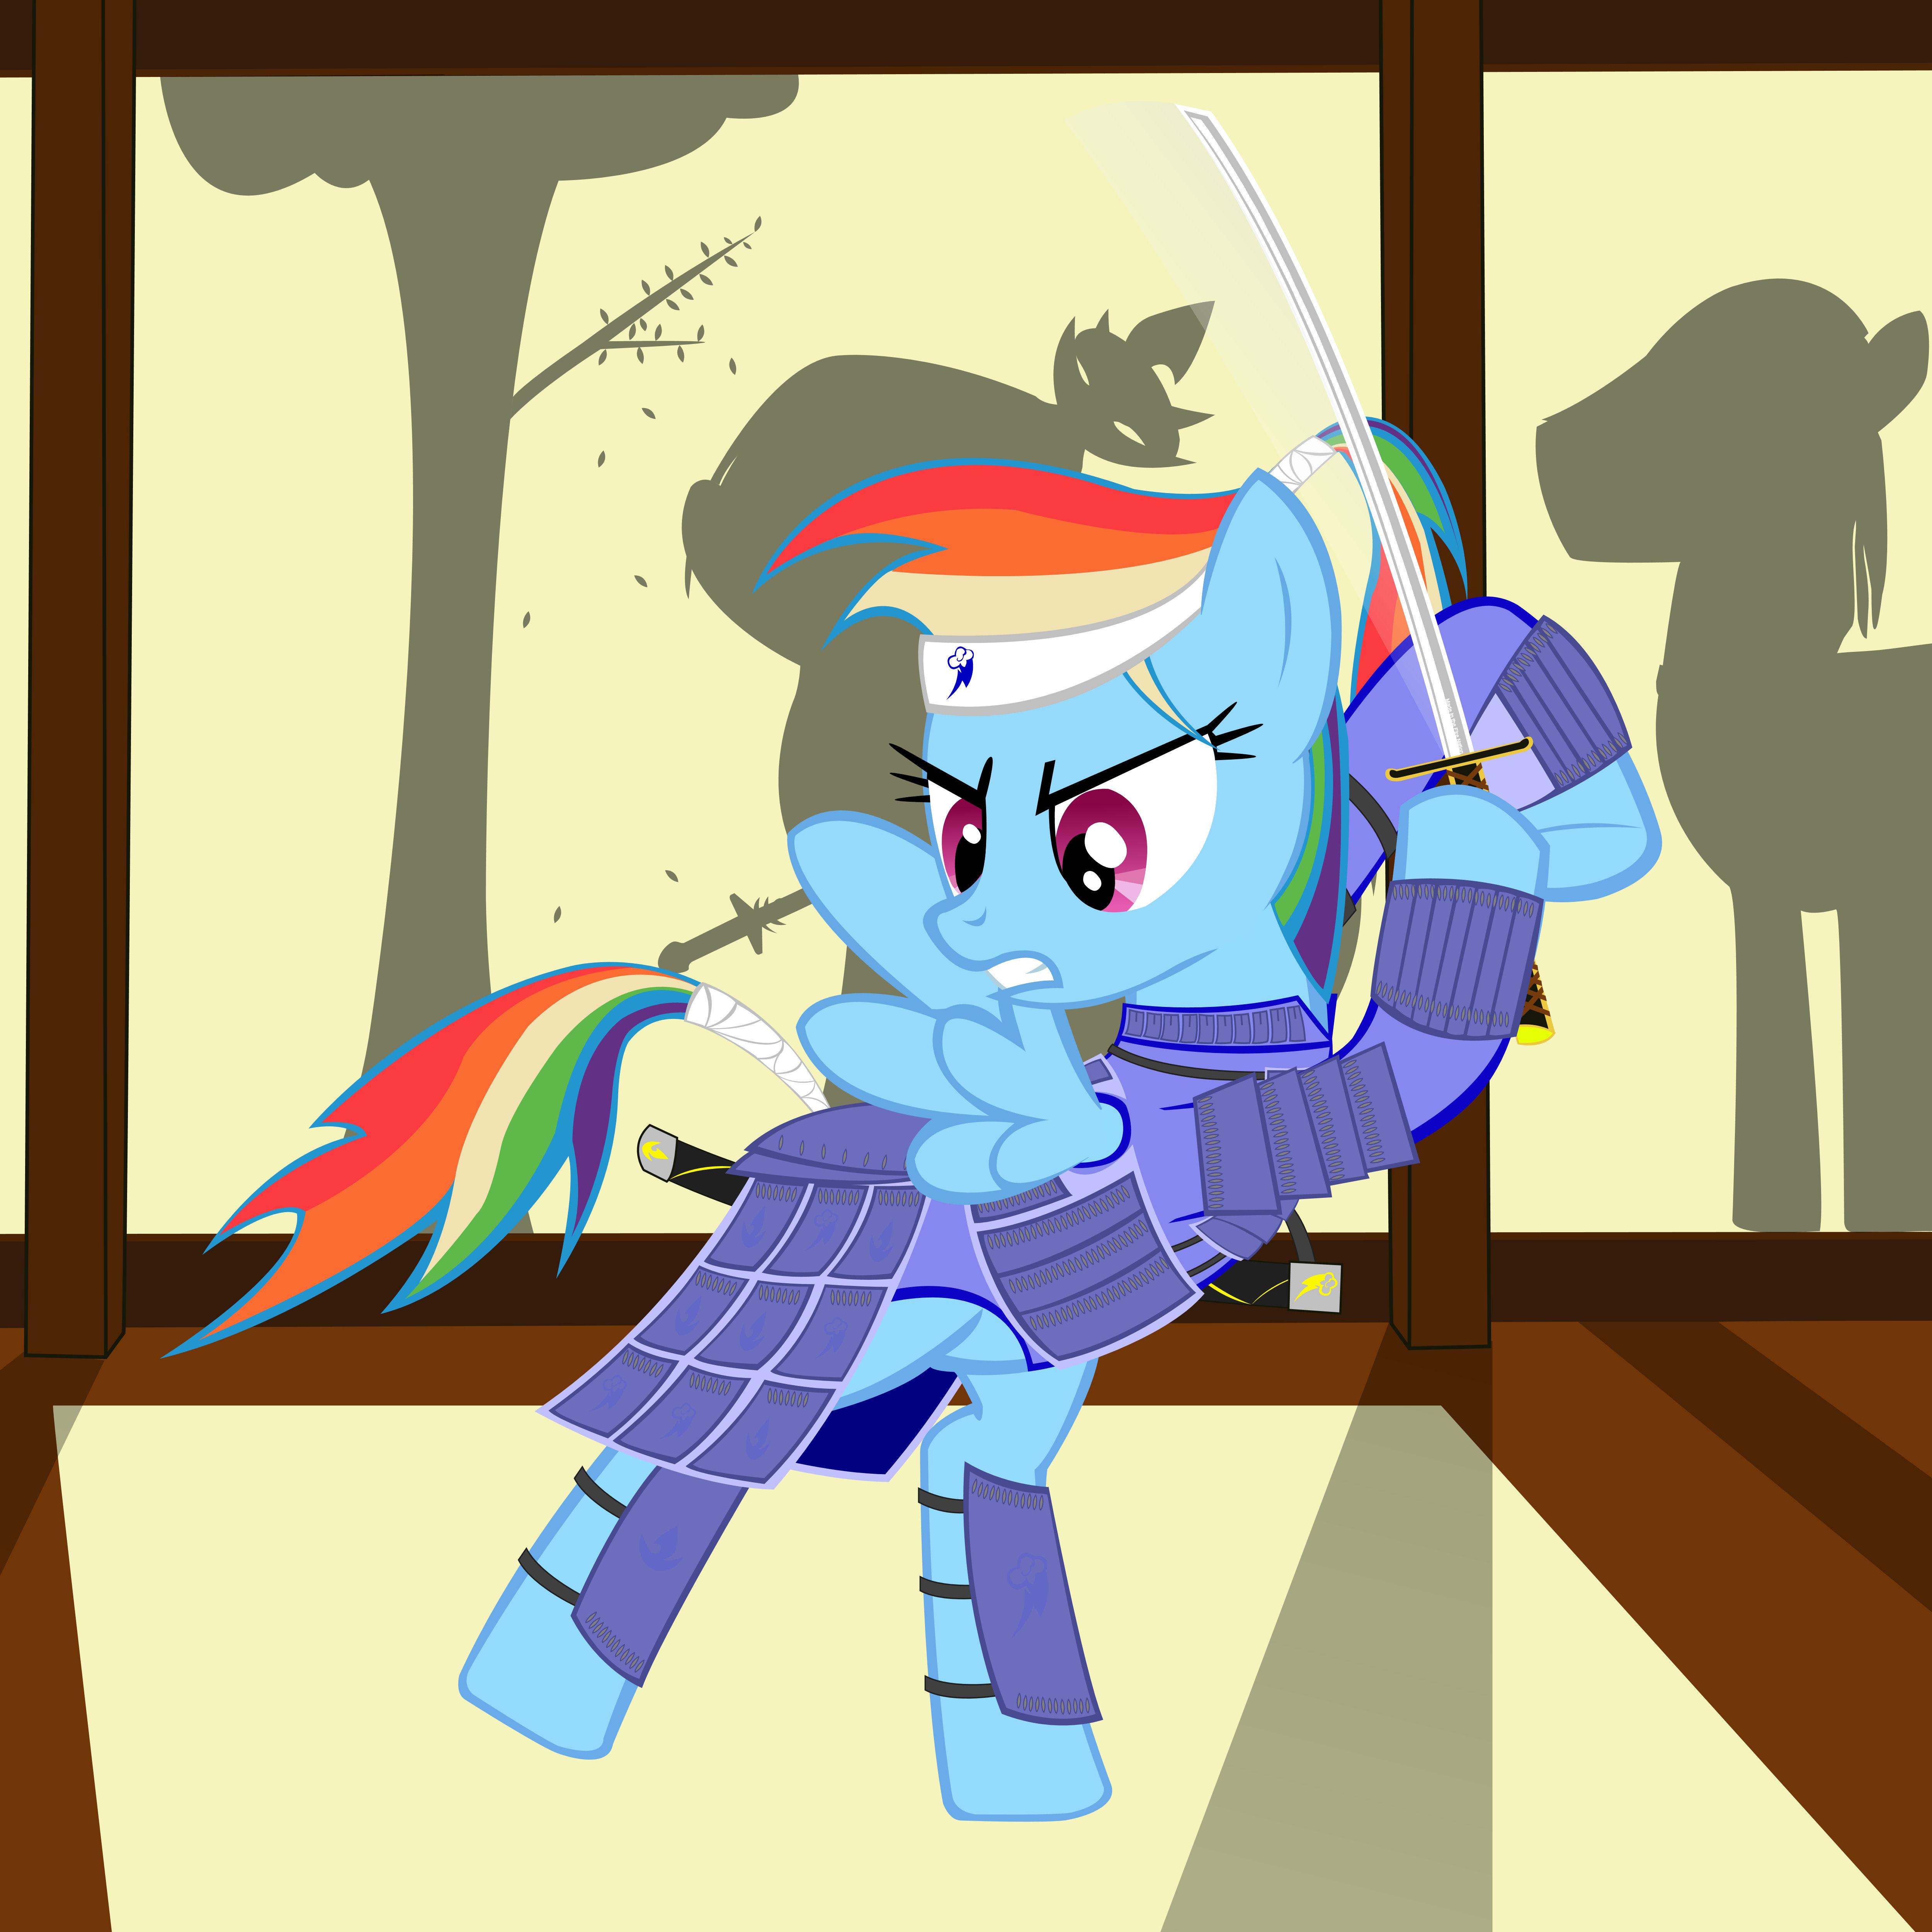 Warriors Of The Rainbow 2 Vietsub: Samurai Rainbow Dash By GennadyKalugina On DeviantArt